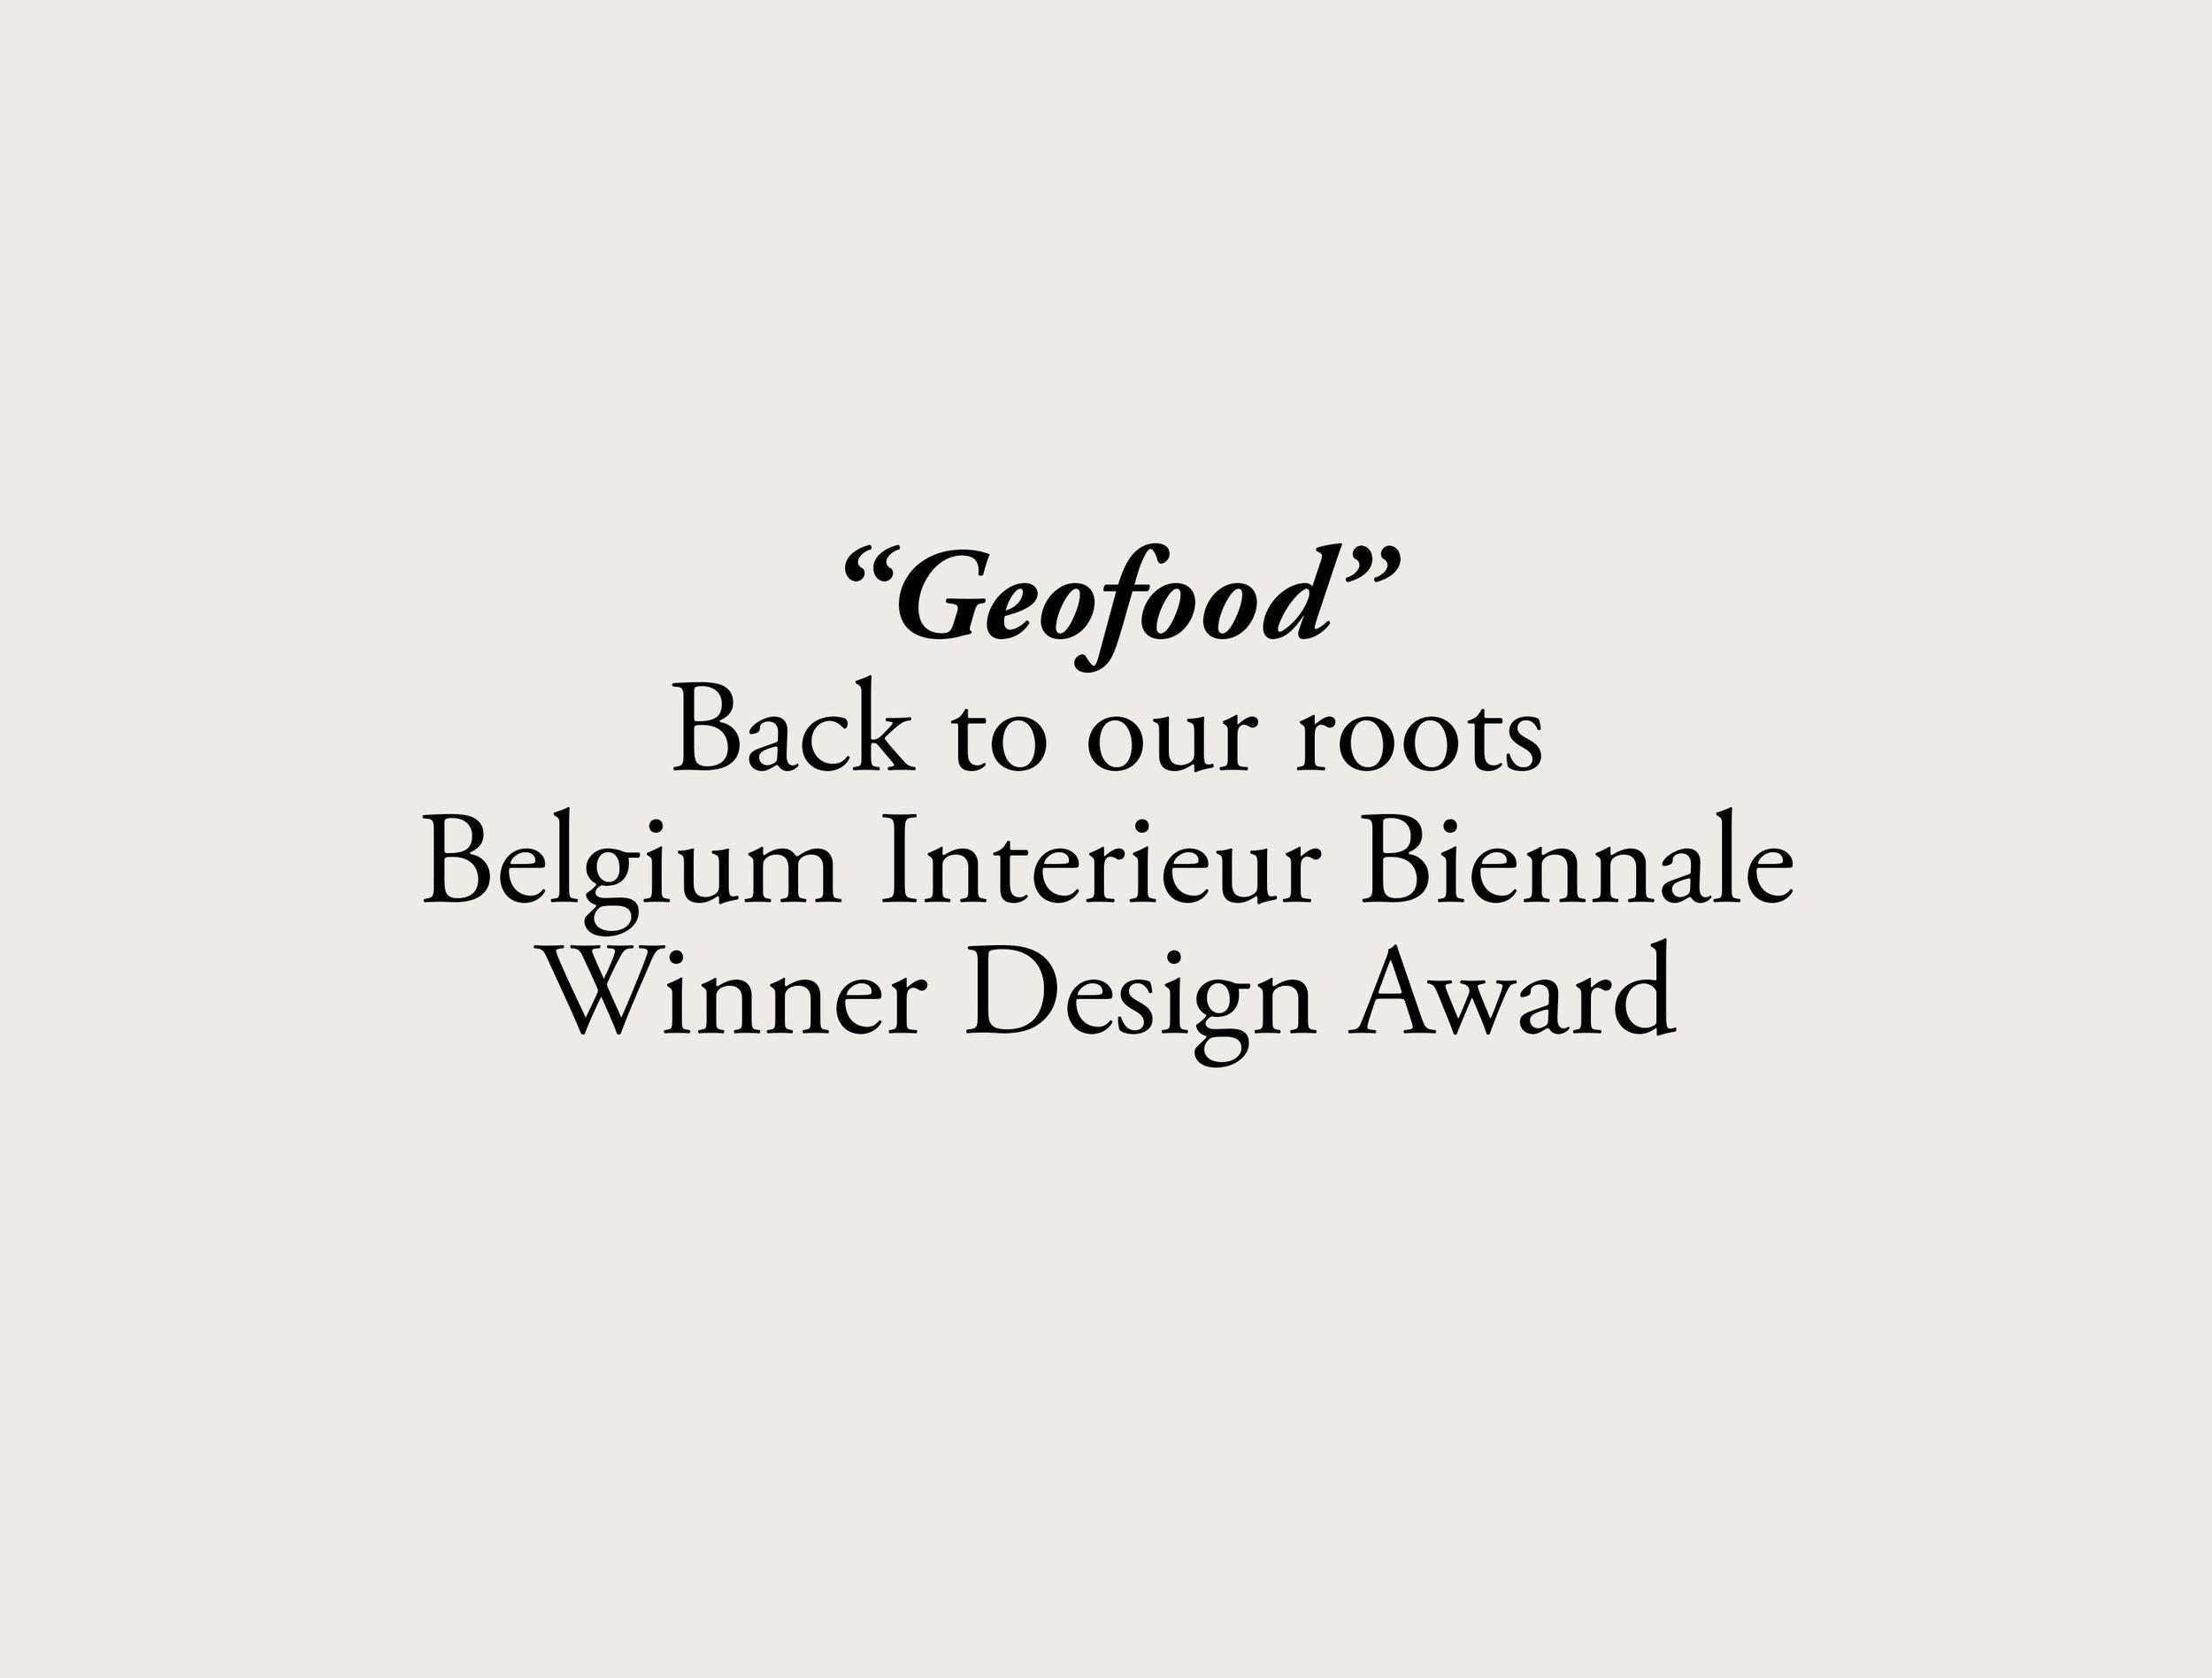 Raams-Architecture-Design-Studio-Geofood-Interieur-Biennale-Kortrijk-Belgium-design-award-winner-restaurant-exhibition-installation-00.jpg